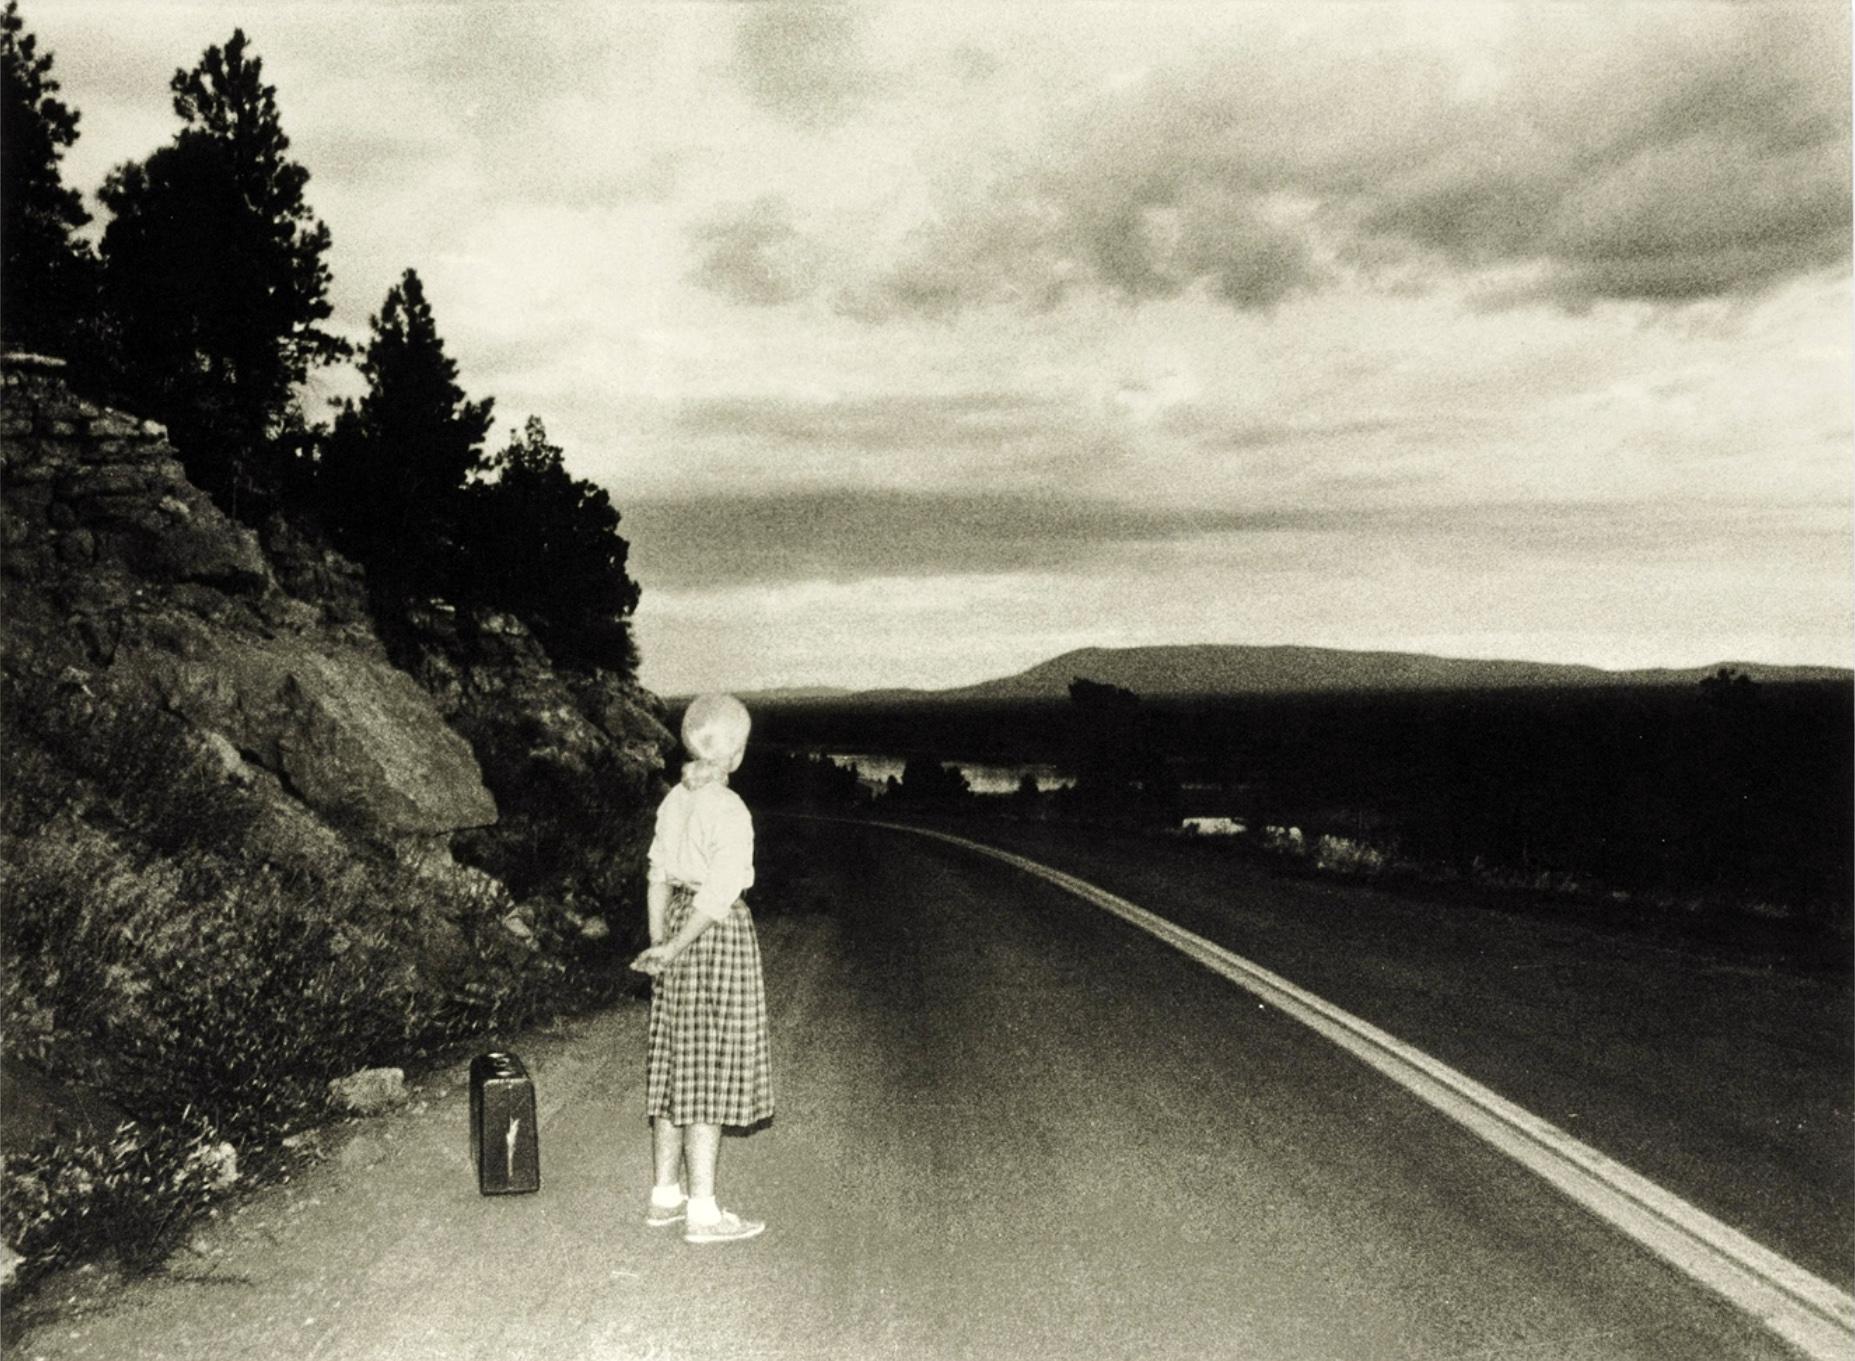 The Hitchhiker x Cindy Sherman